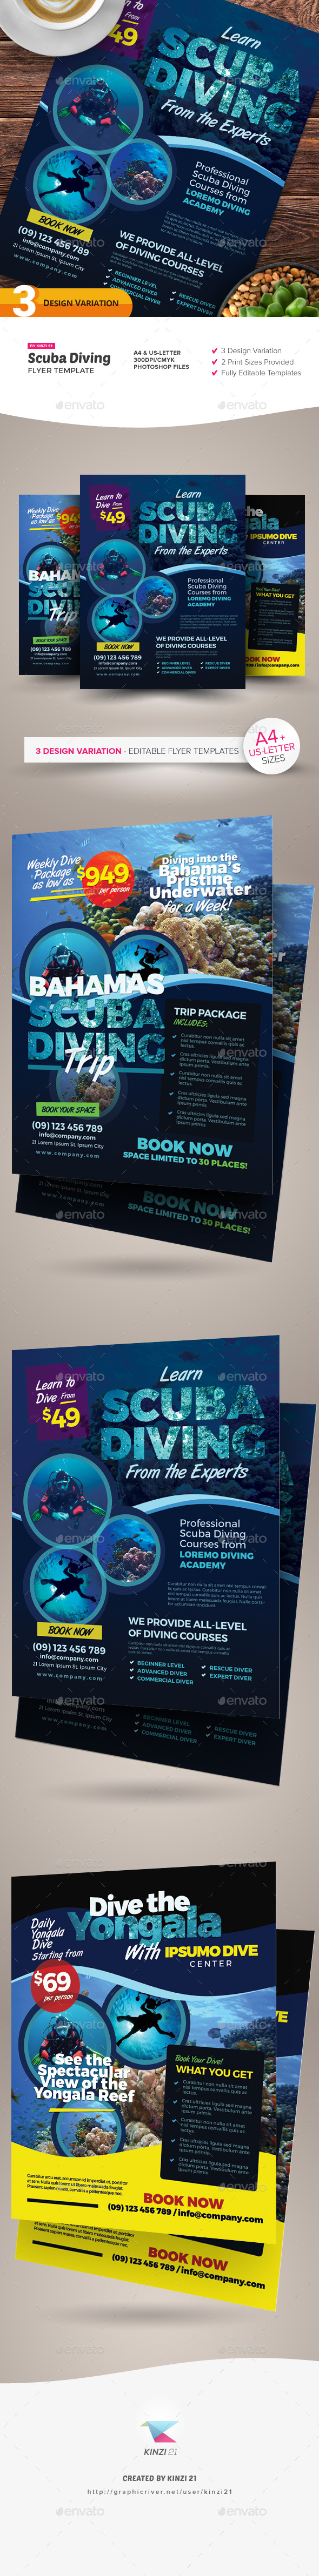 Scuba Graphics Designs & Templates from GraphicRiver